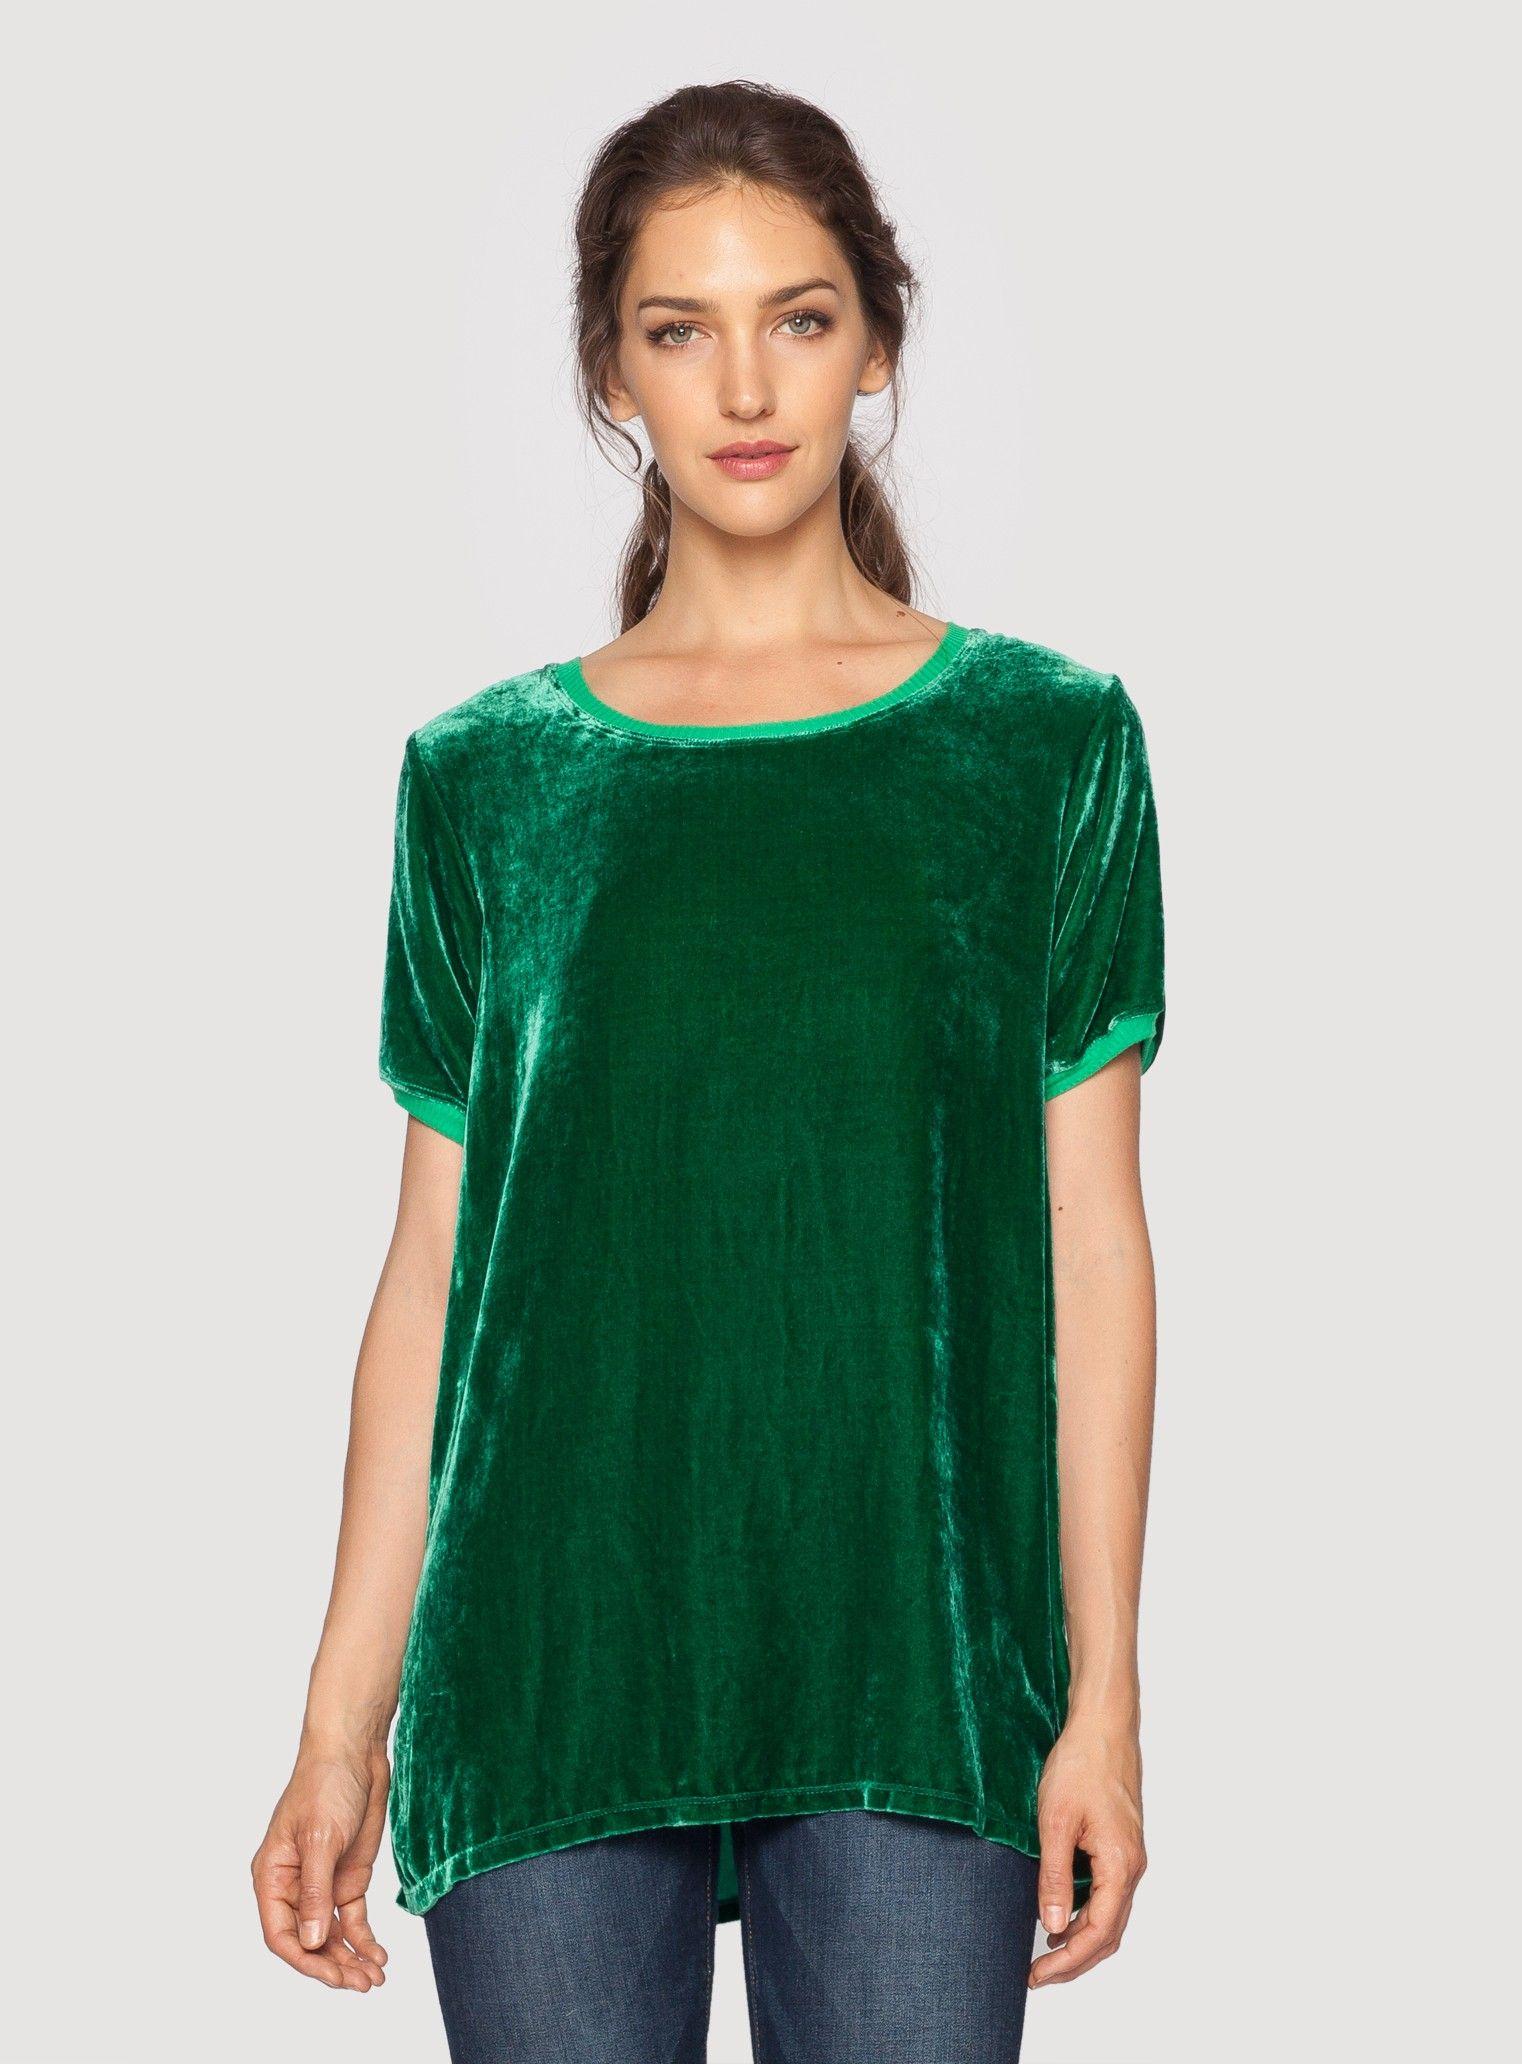 Johnny Was Clothing Pete and Greta Keisha Velvet T-Shirt in Green #johnnywas